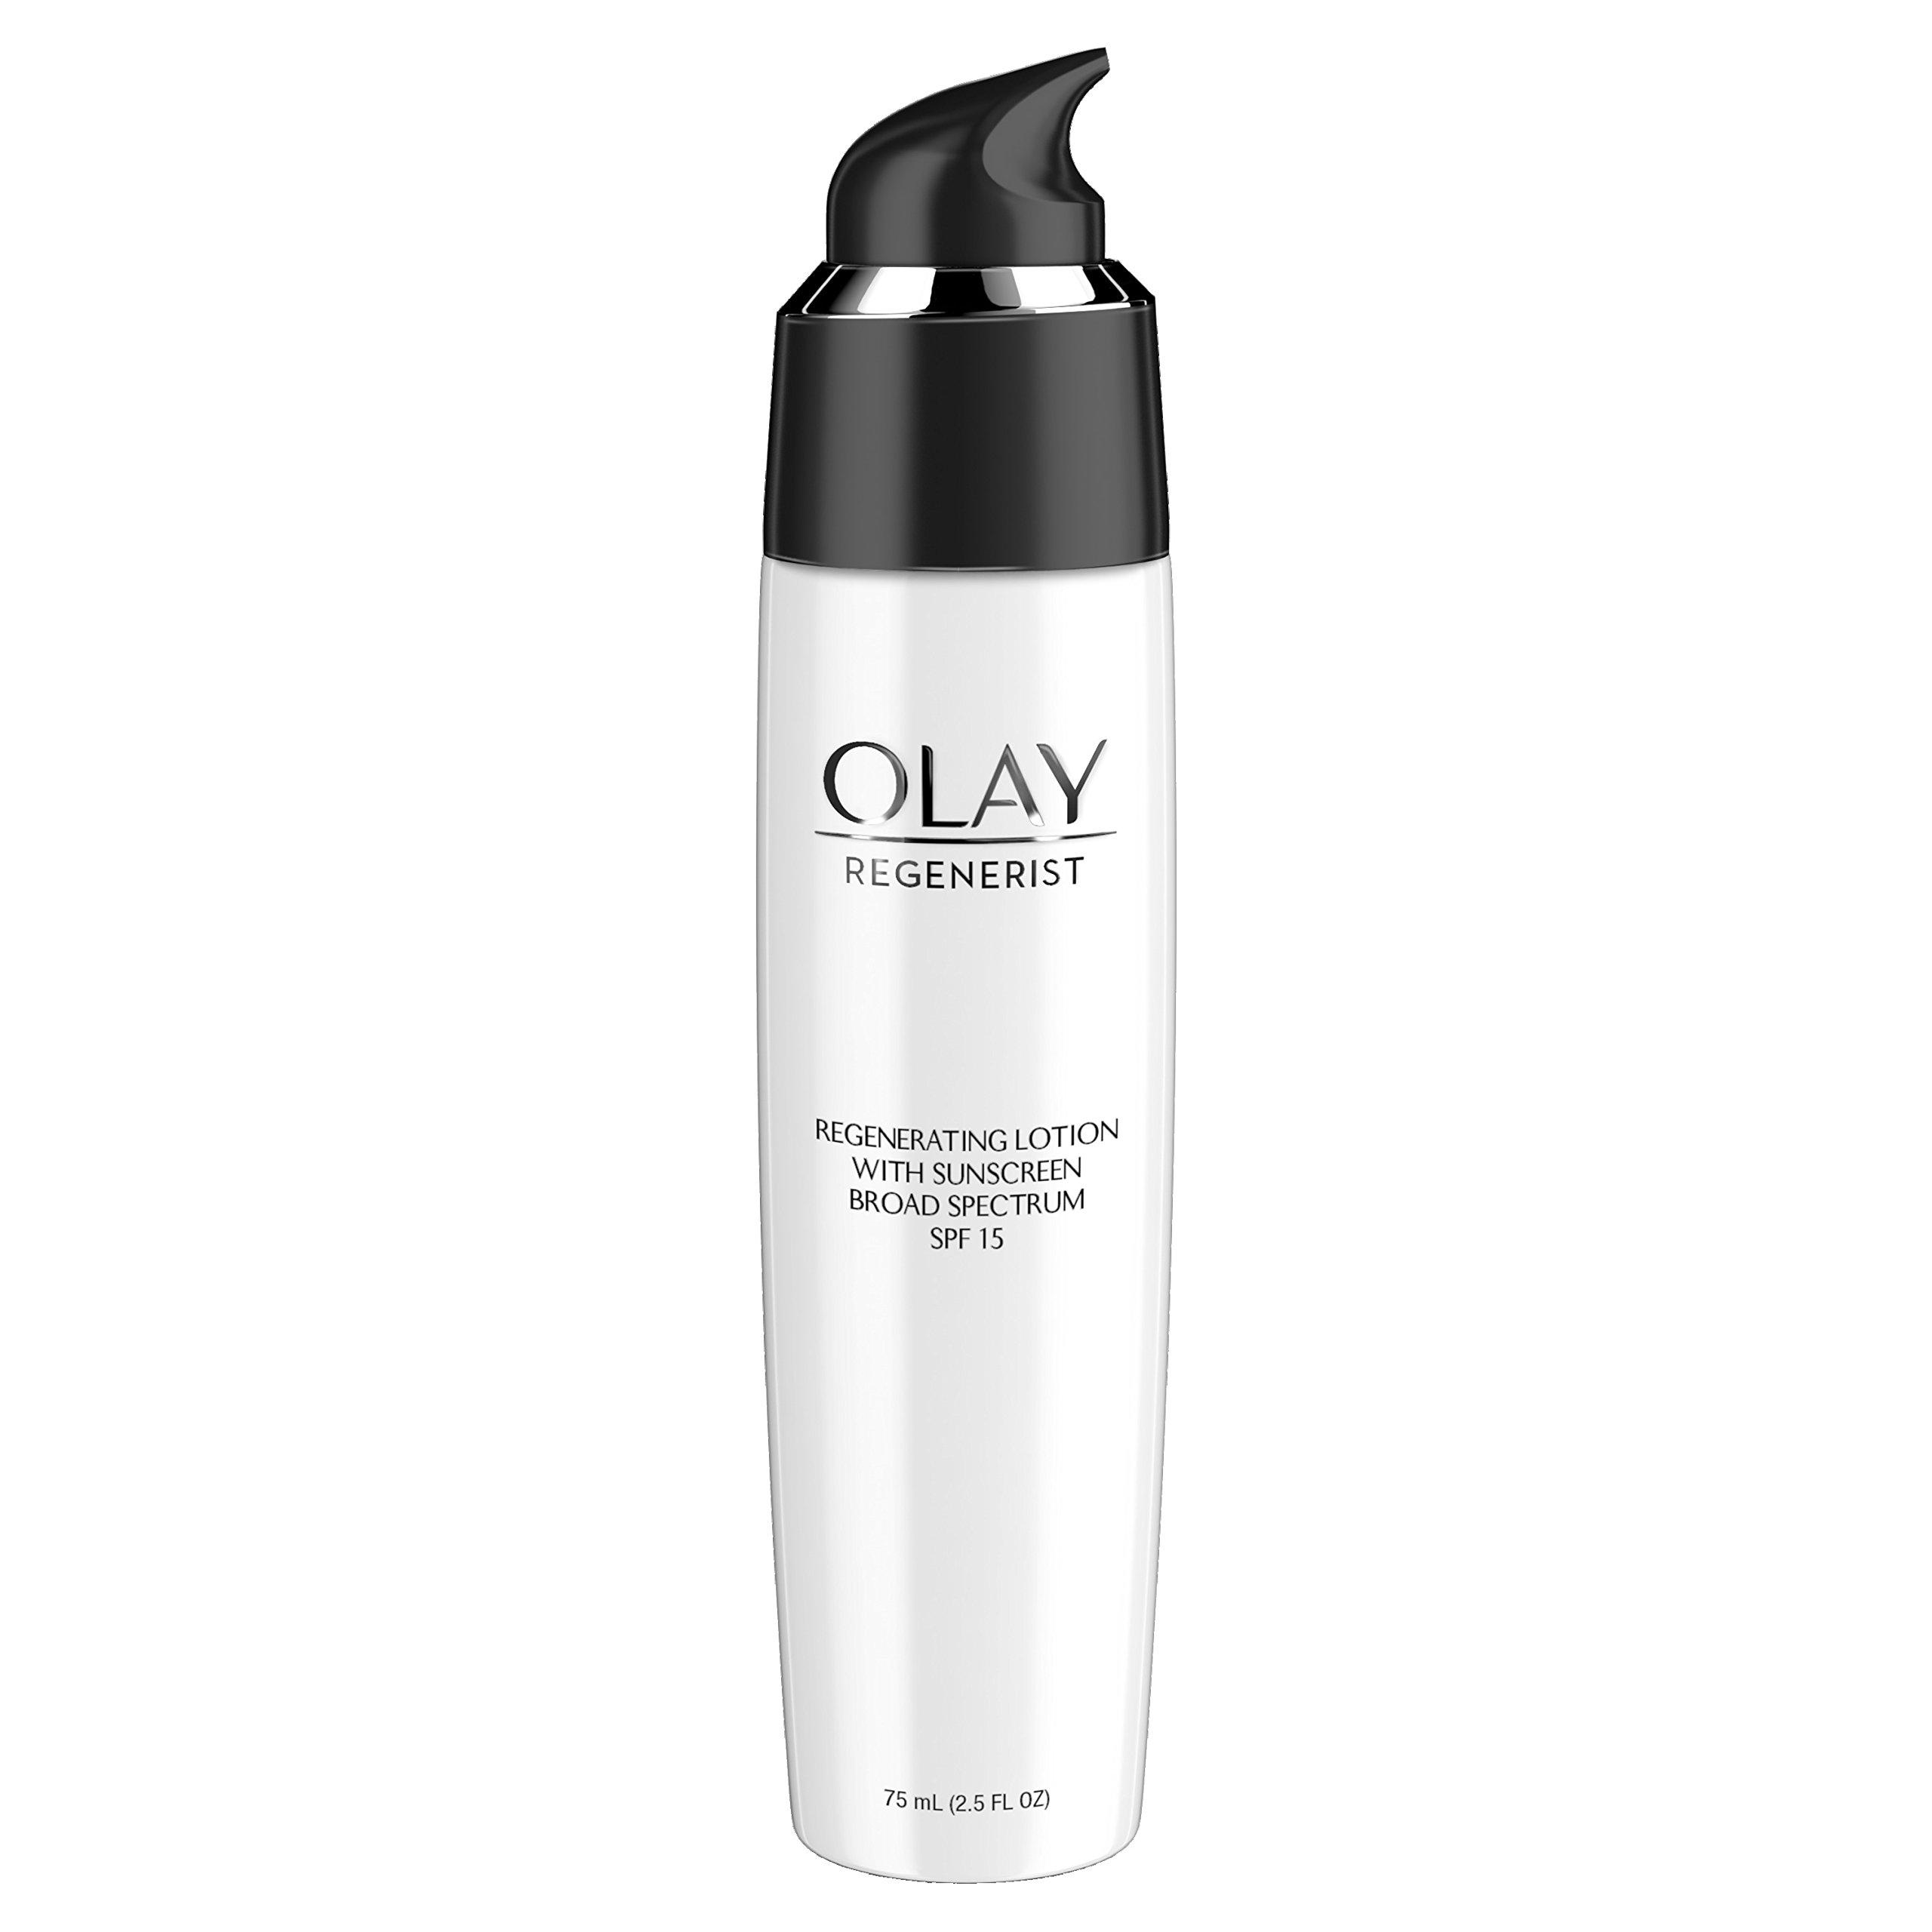 Face Moisturizer by Olay Regenerist Enhancing UV Lotion Advanced Anti-Aging 75ml by Olay